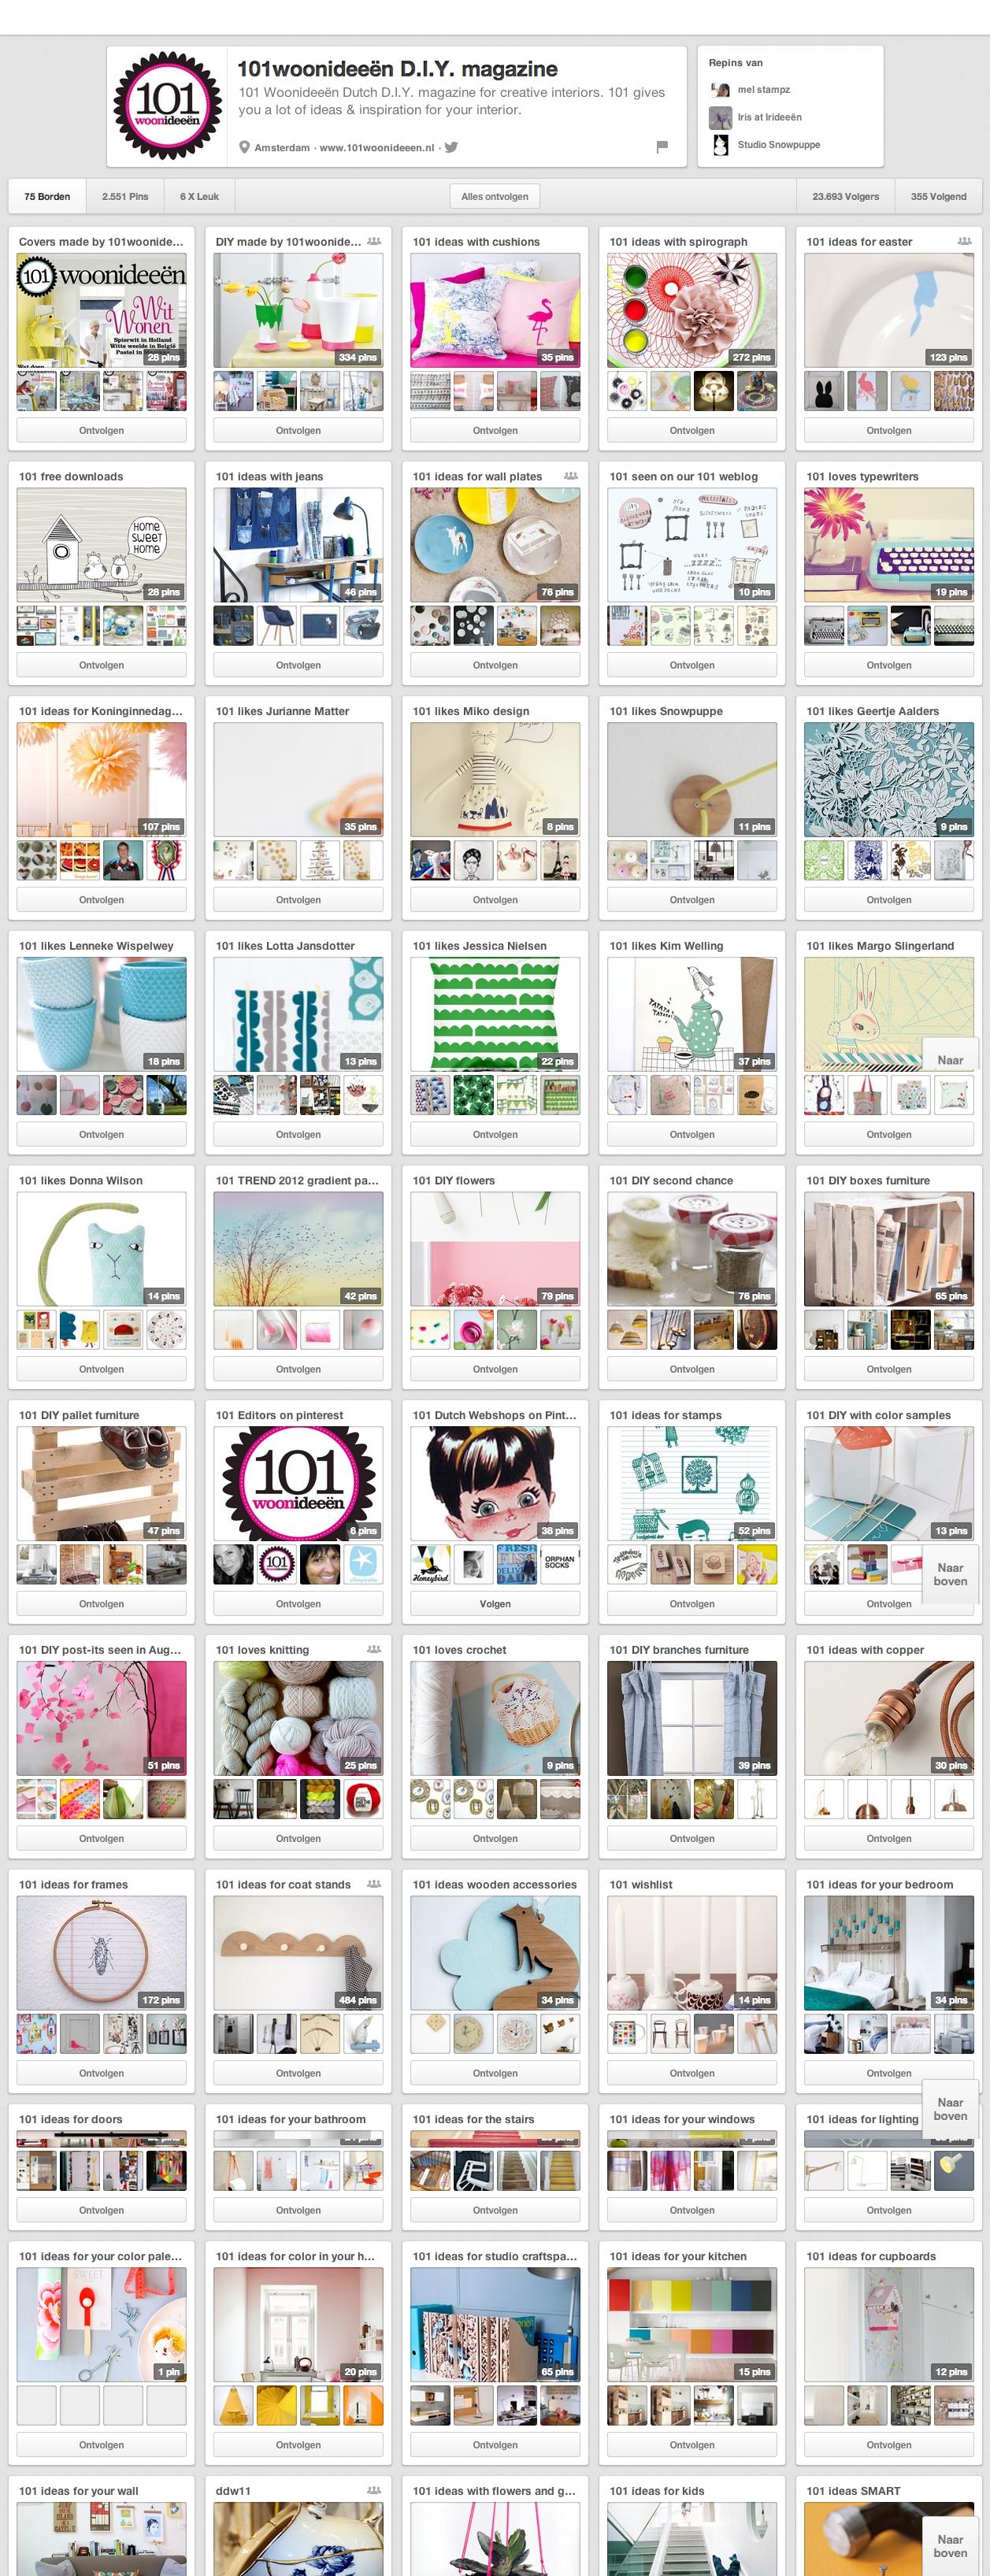 pinterest webwinkelmarketing 101woonideeën D.I.Y. magazine (101woonideeen) on Pinterest